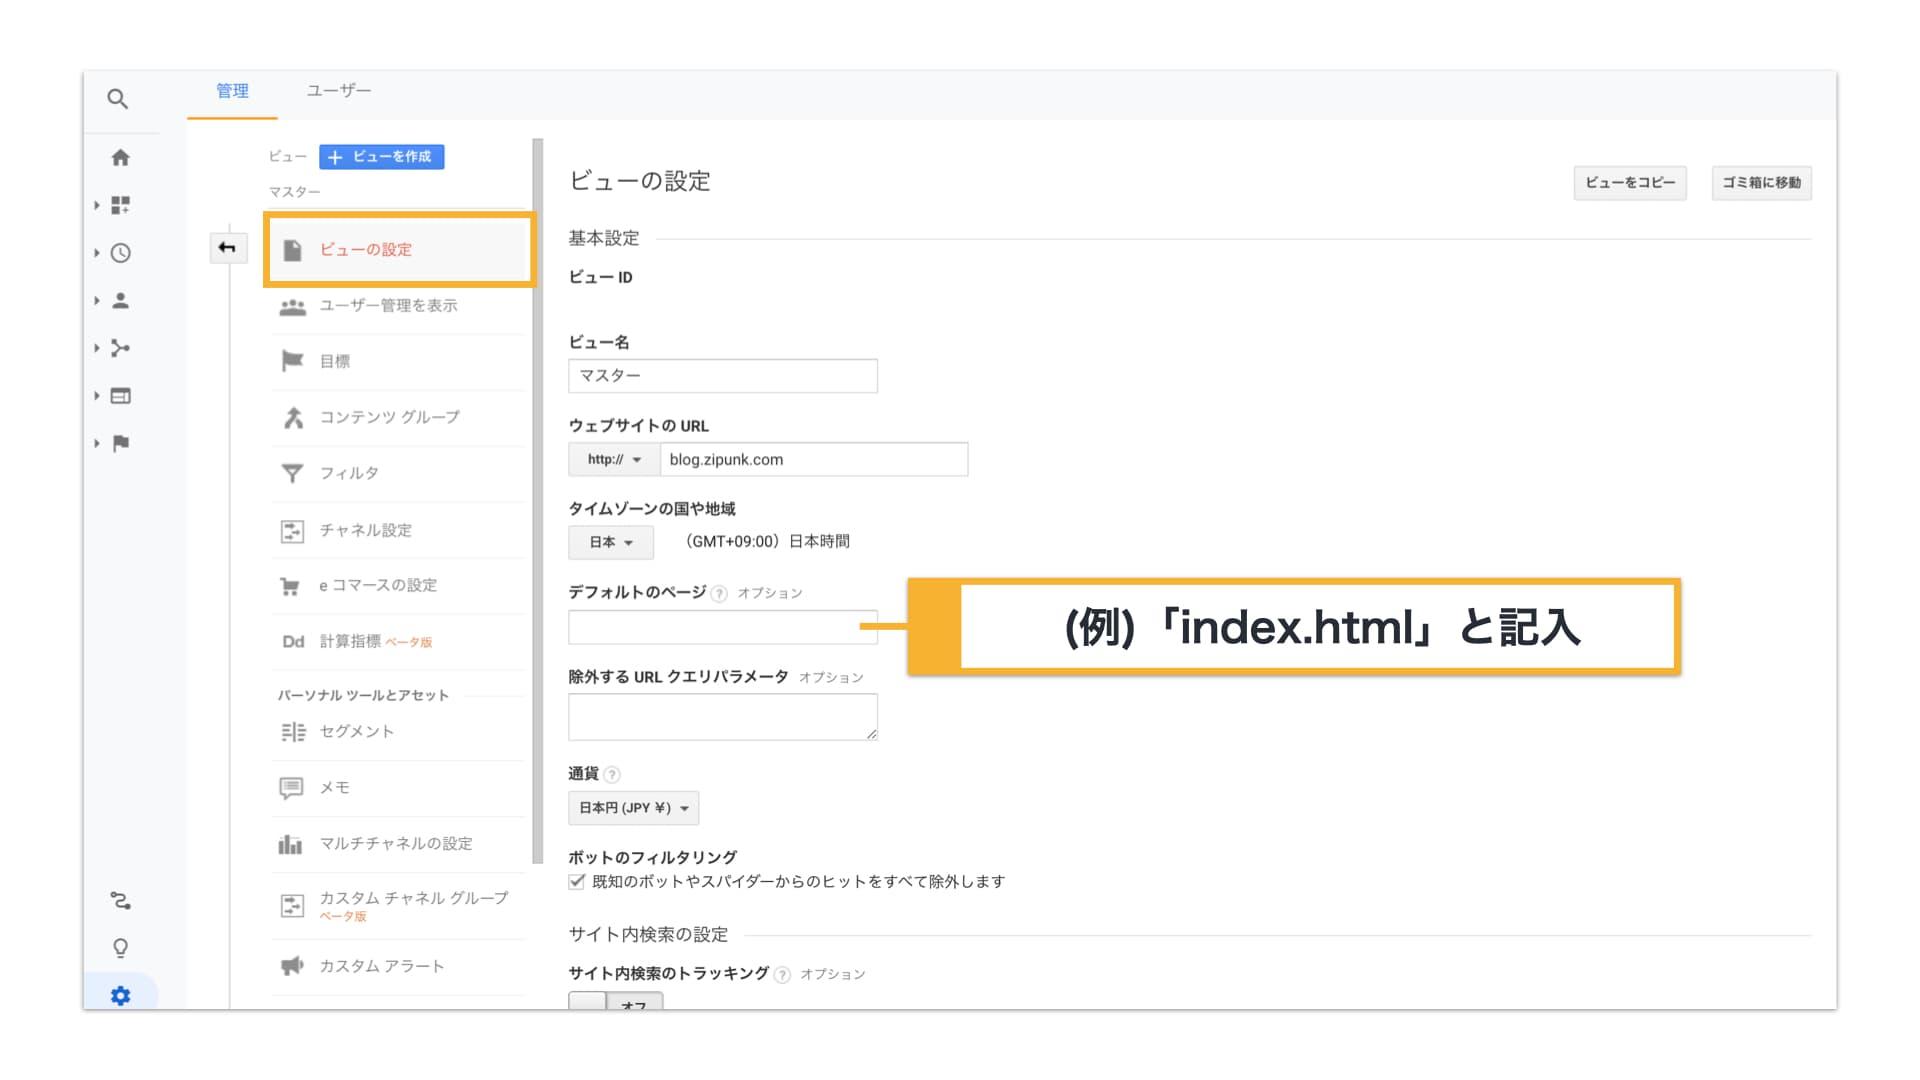 ga-initial-settings-default-page